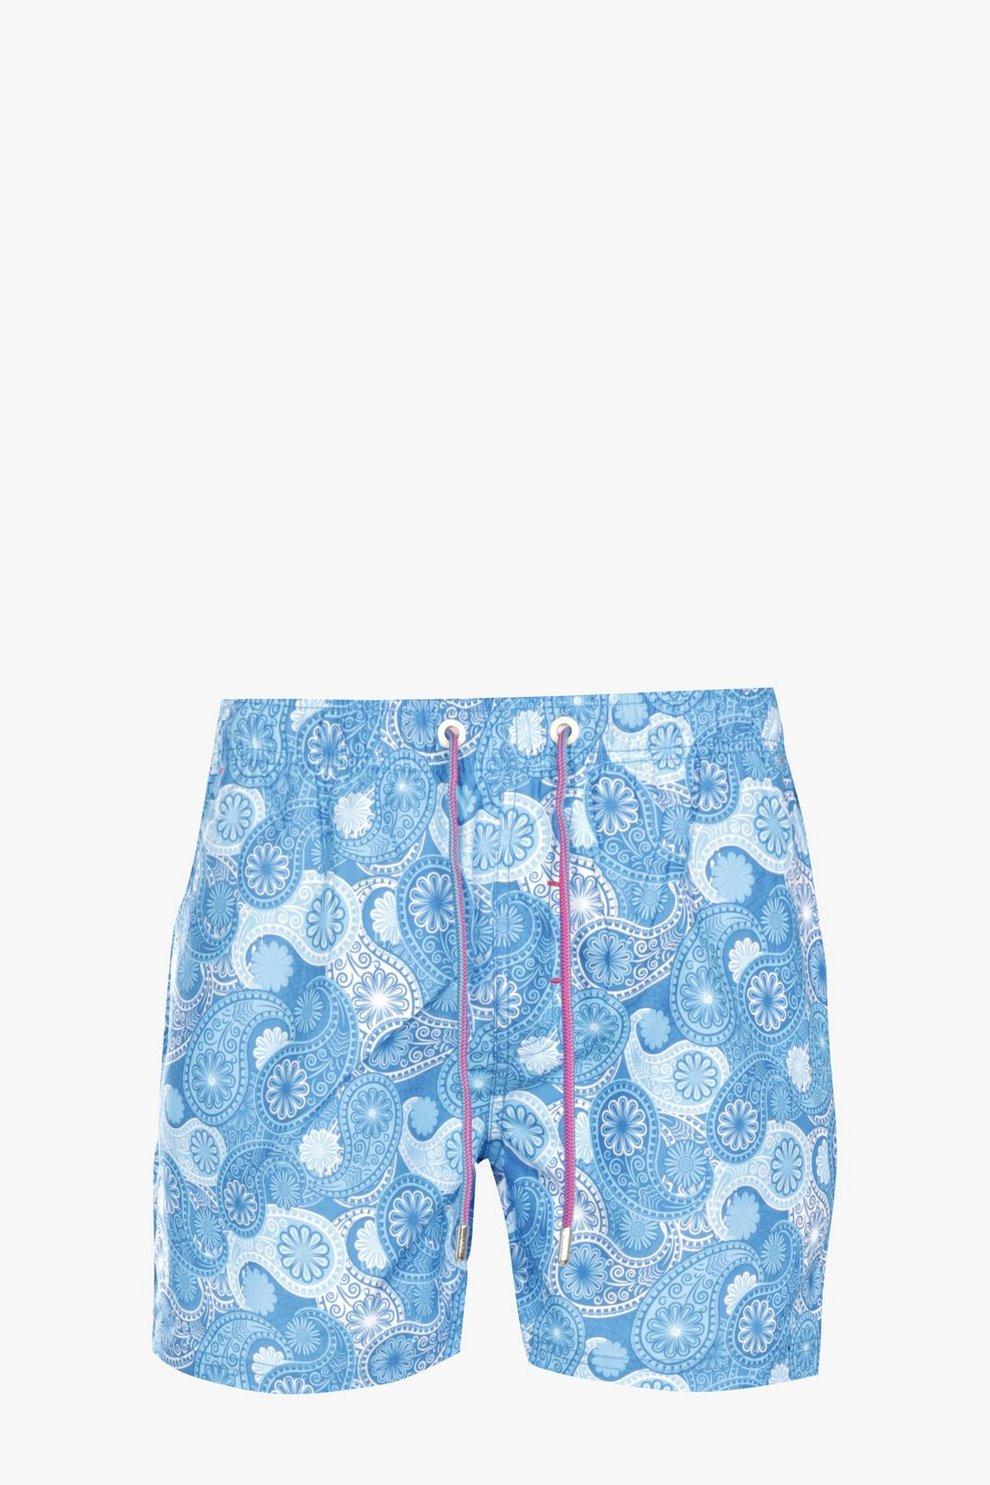 e27f42126bf6e Blue Paisley Print Swim Short | Boohoo